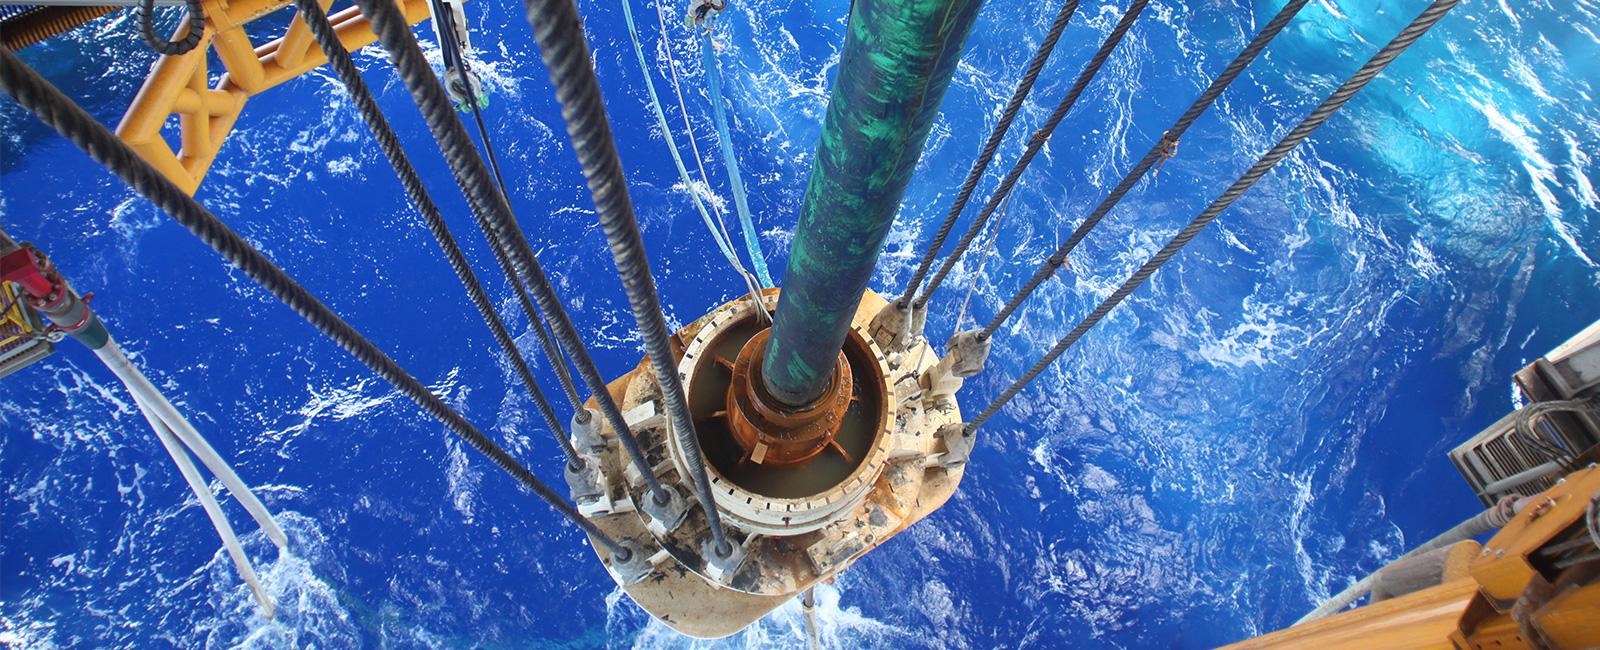 Kenya | Tullow Oil plc (LSE: TLW)